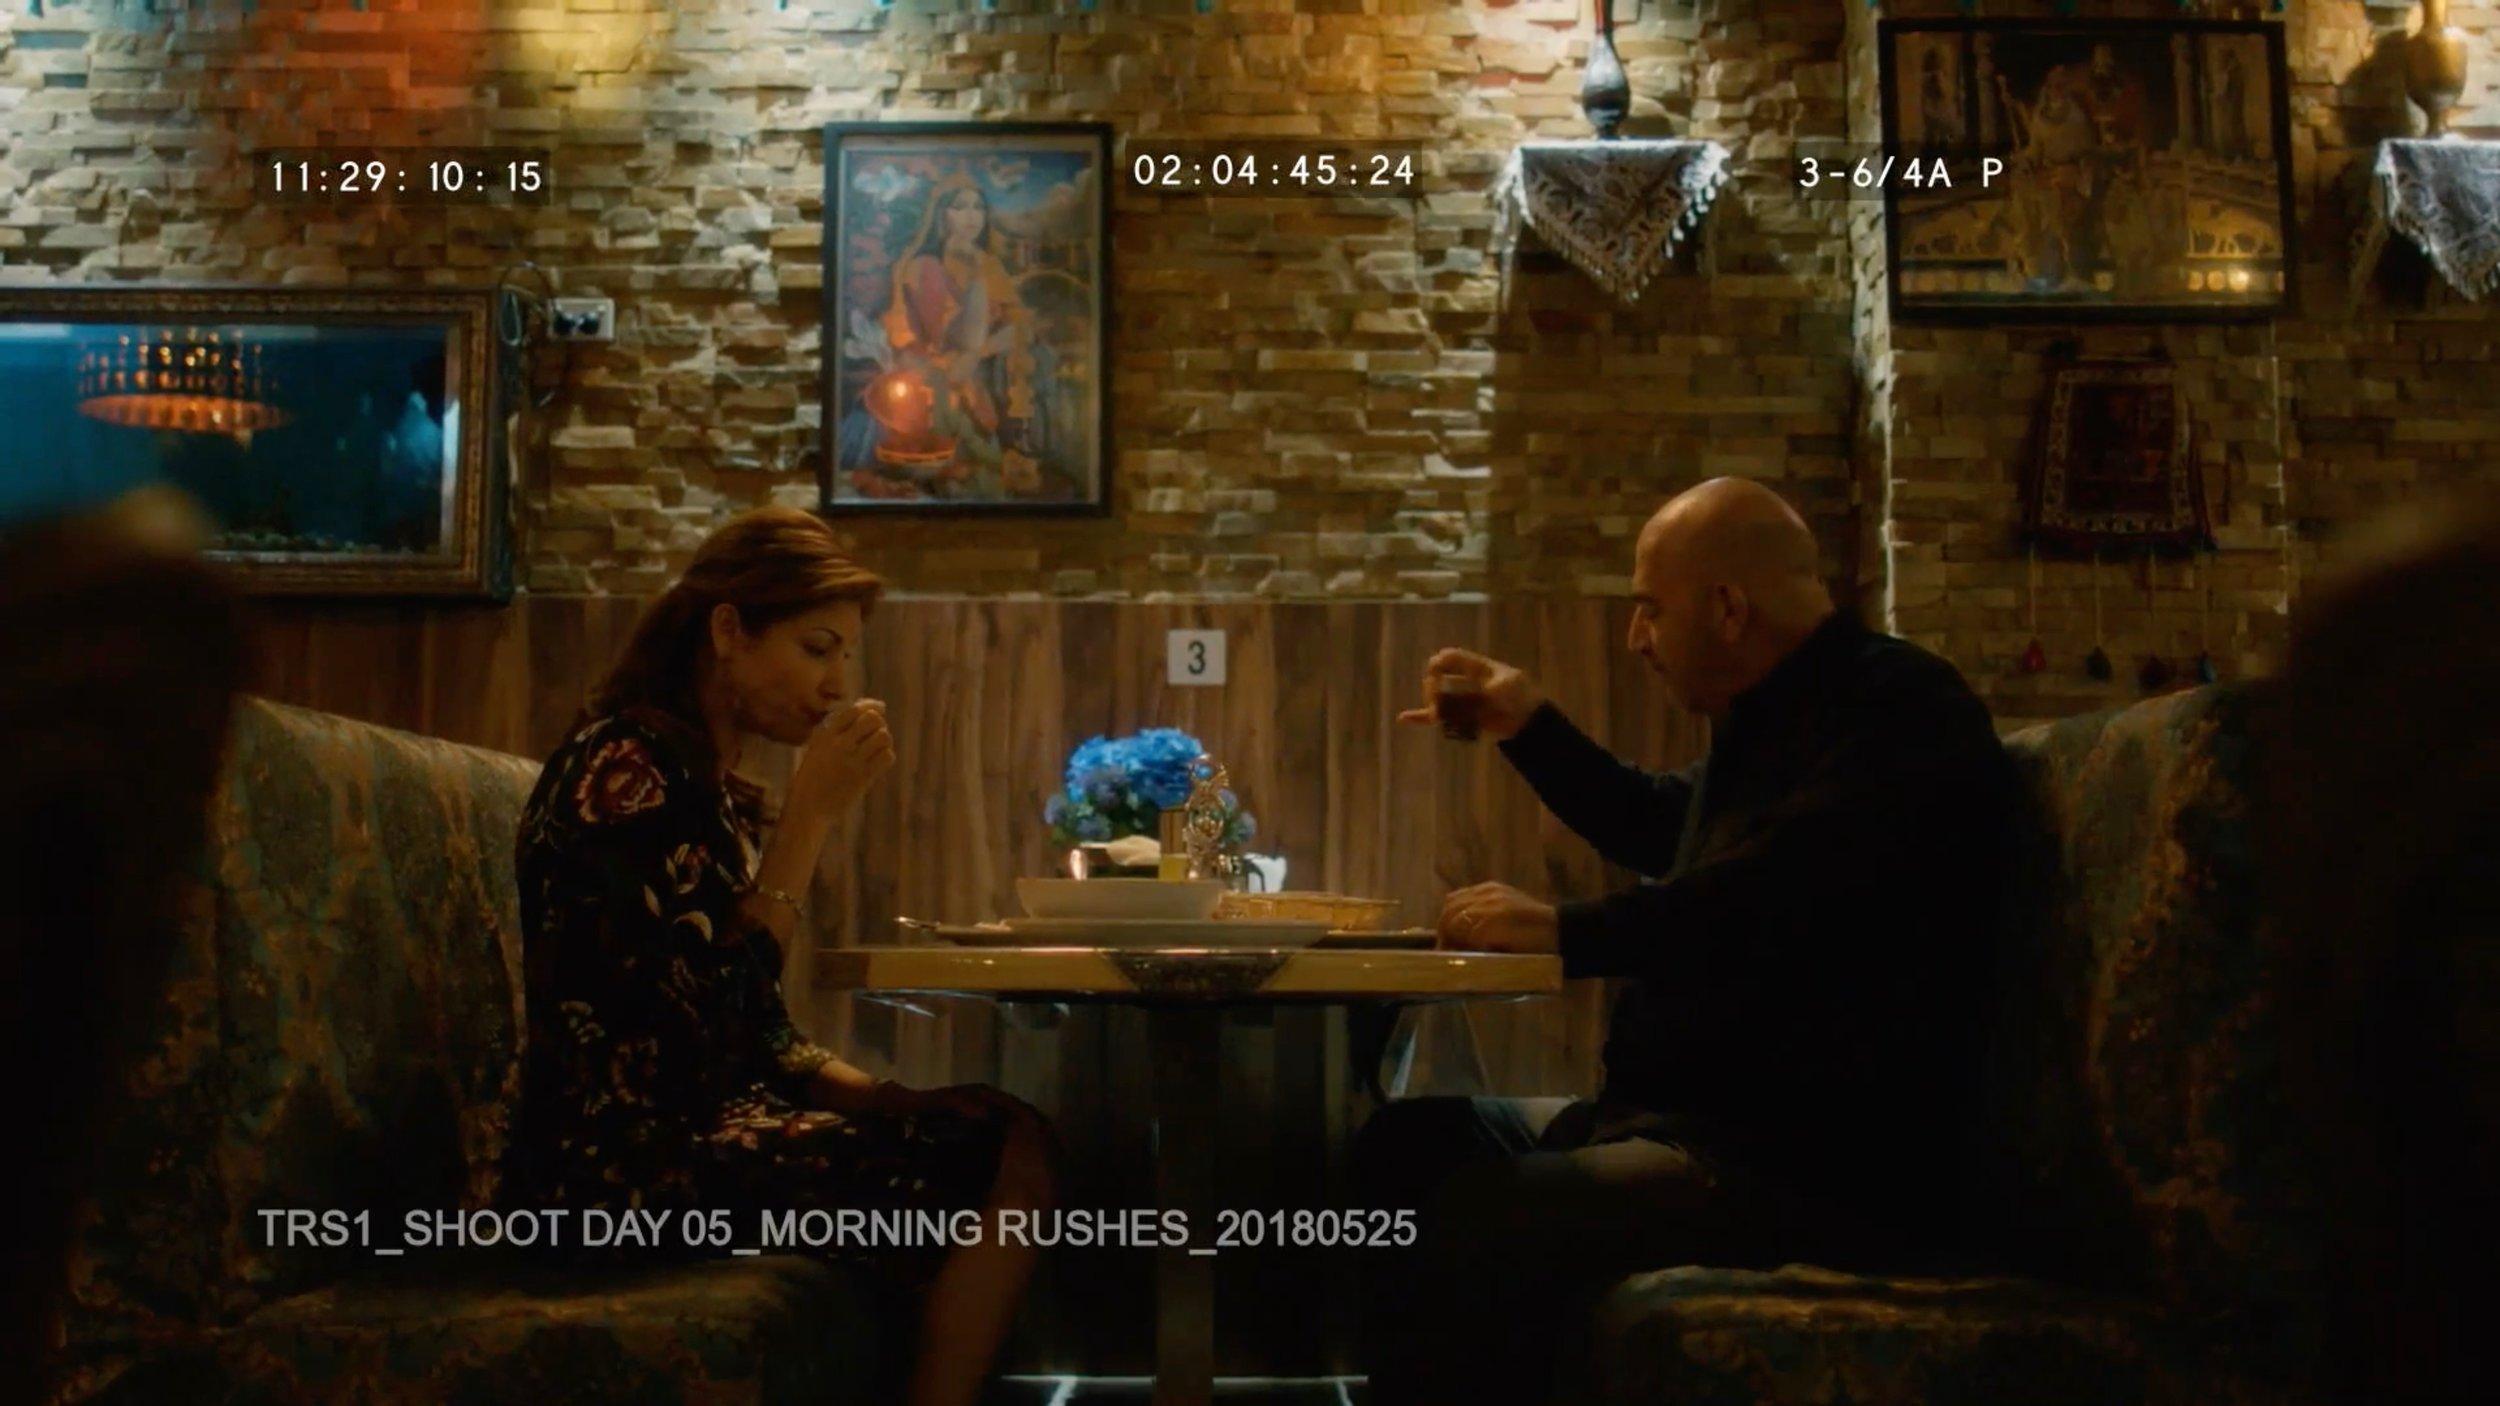 Screen Shot 2018-06-04 at 4.30.29 pm copy.jpg